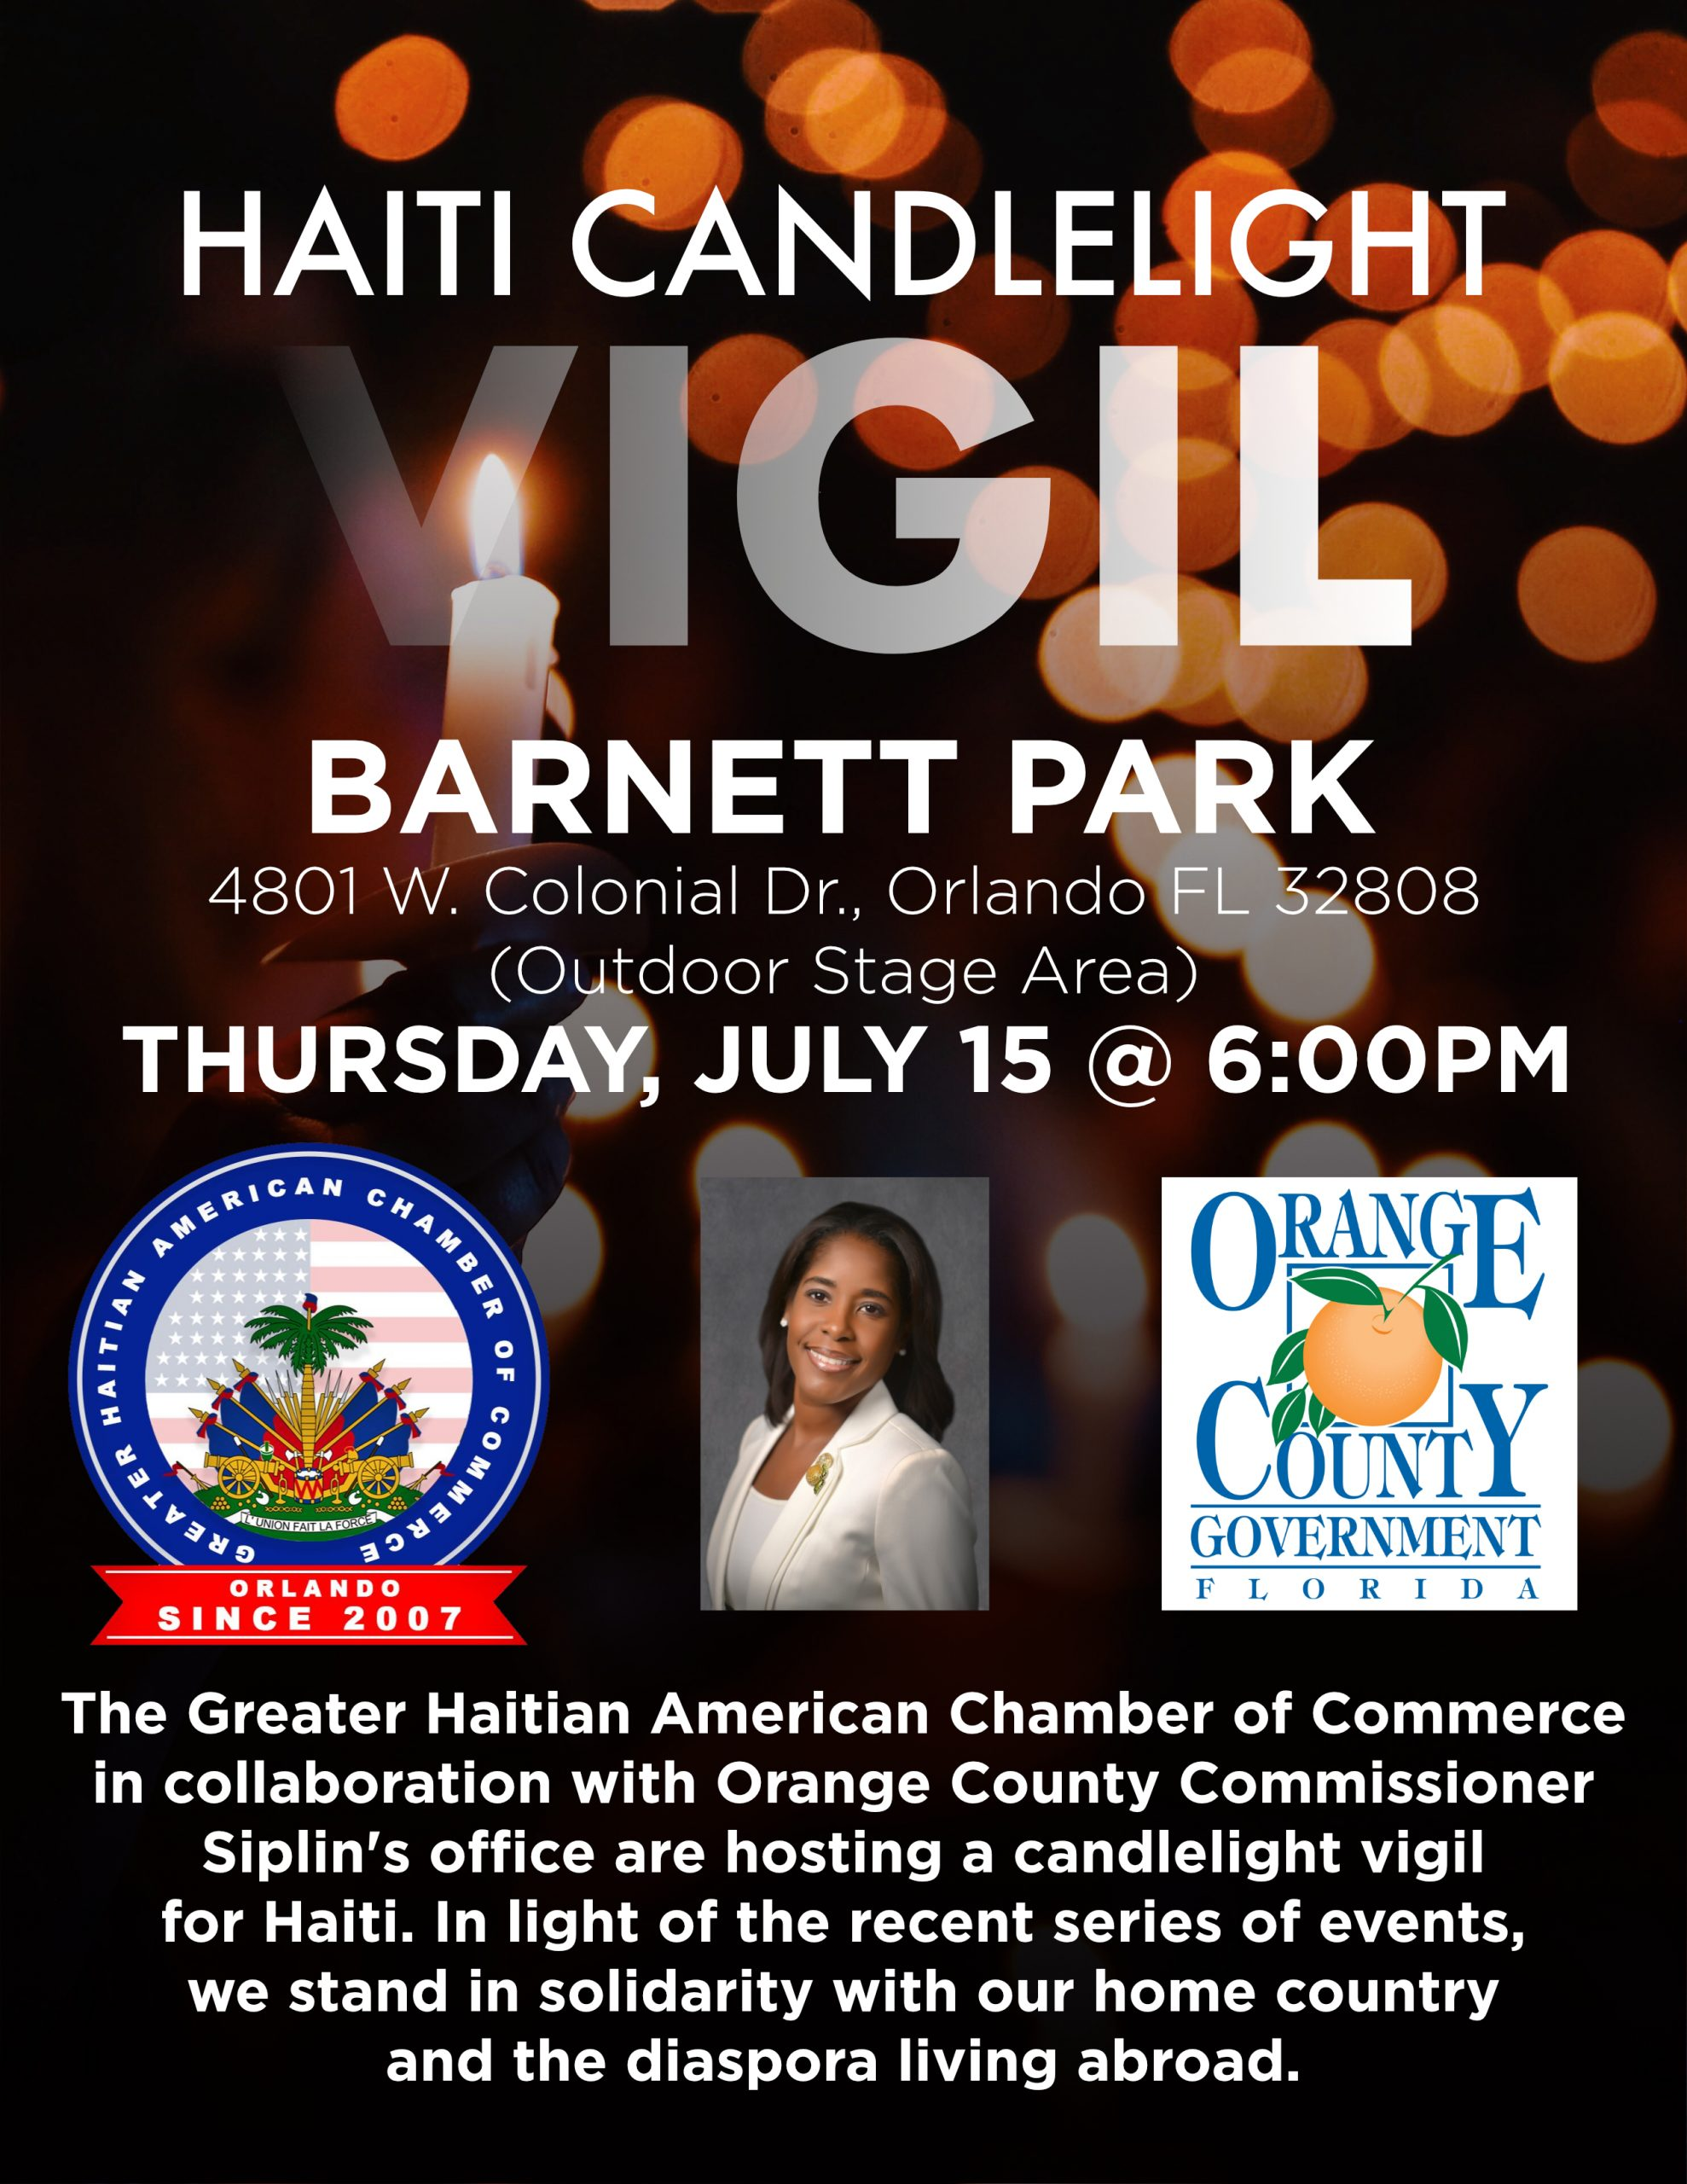 Hait Candlelight Vigil